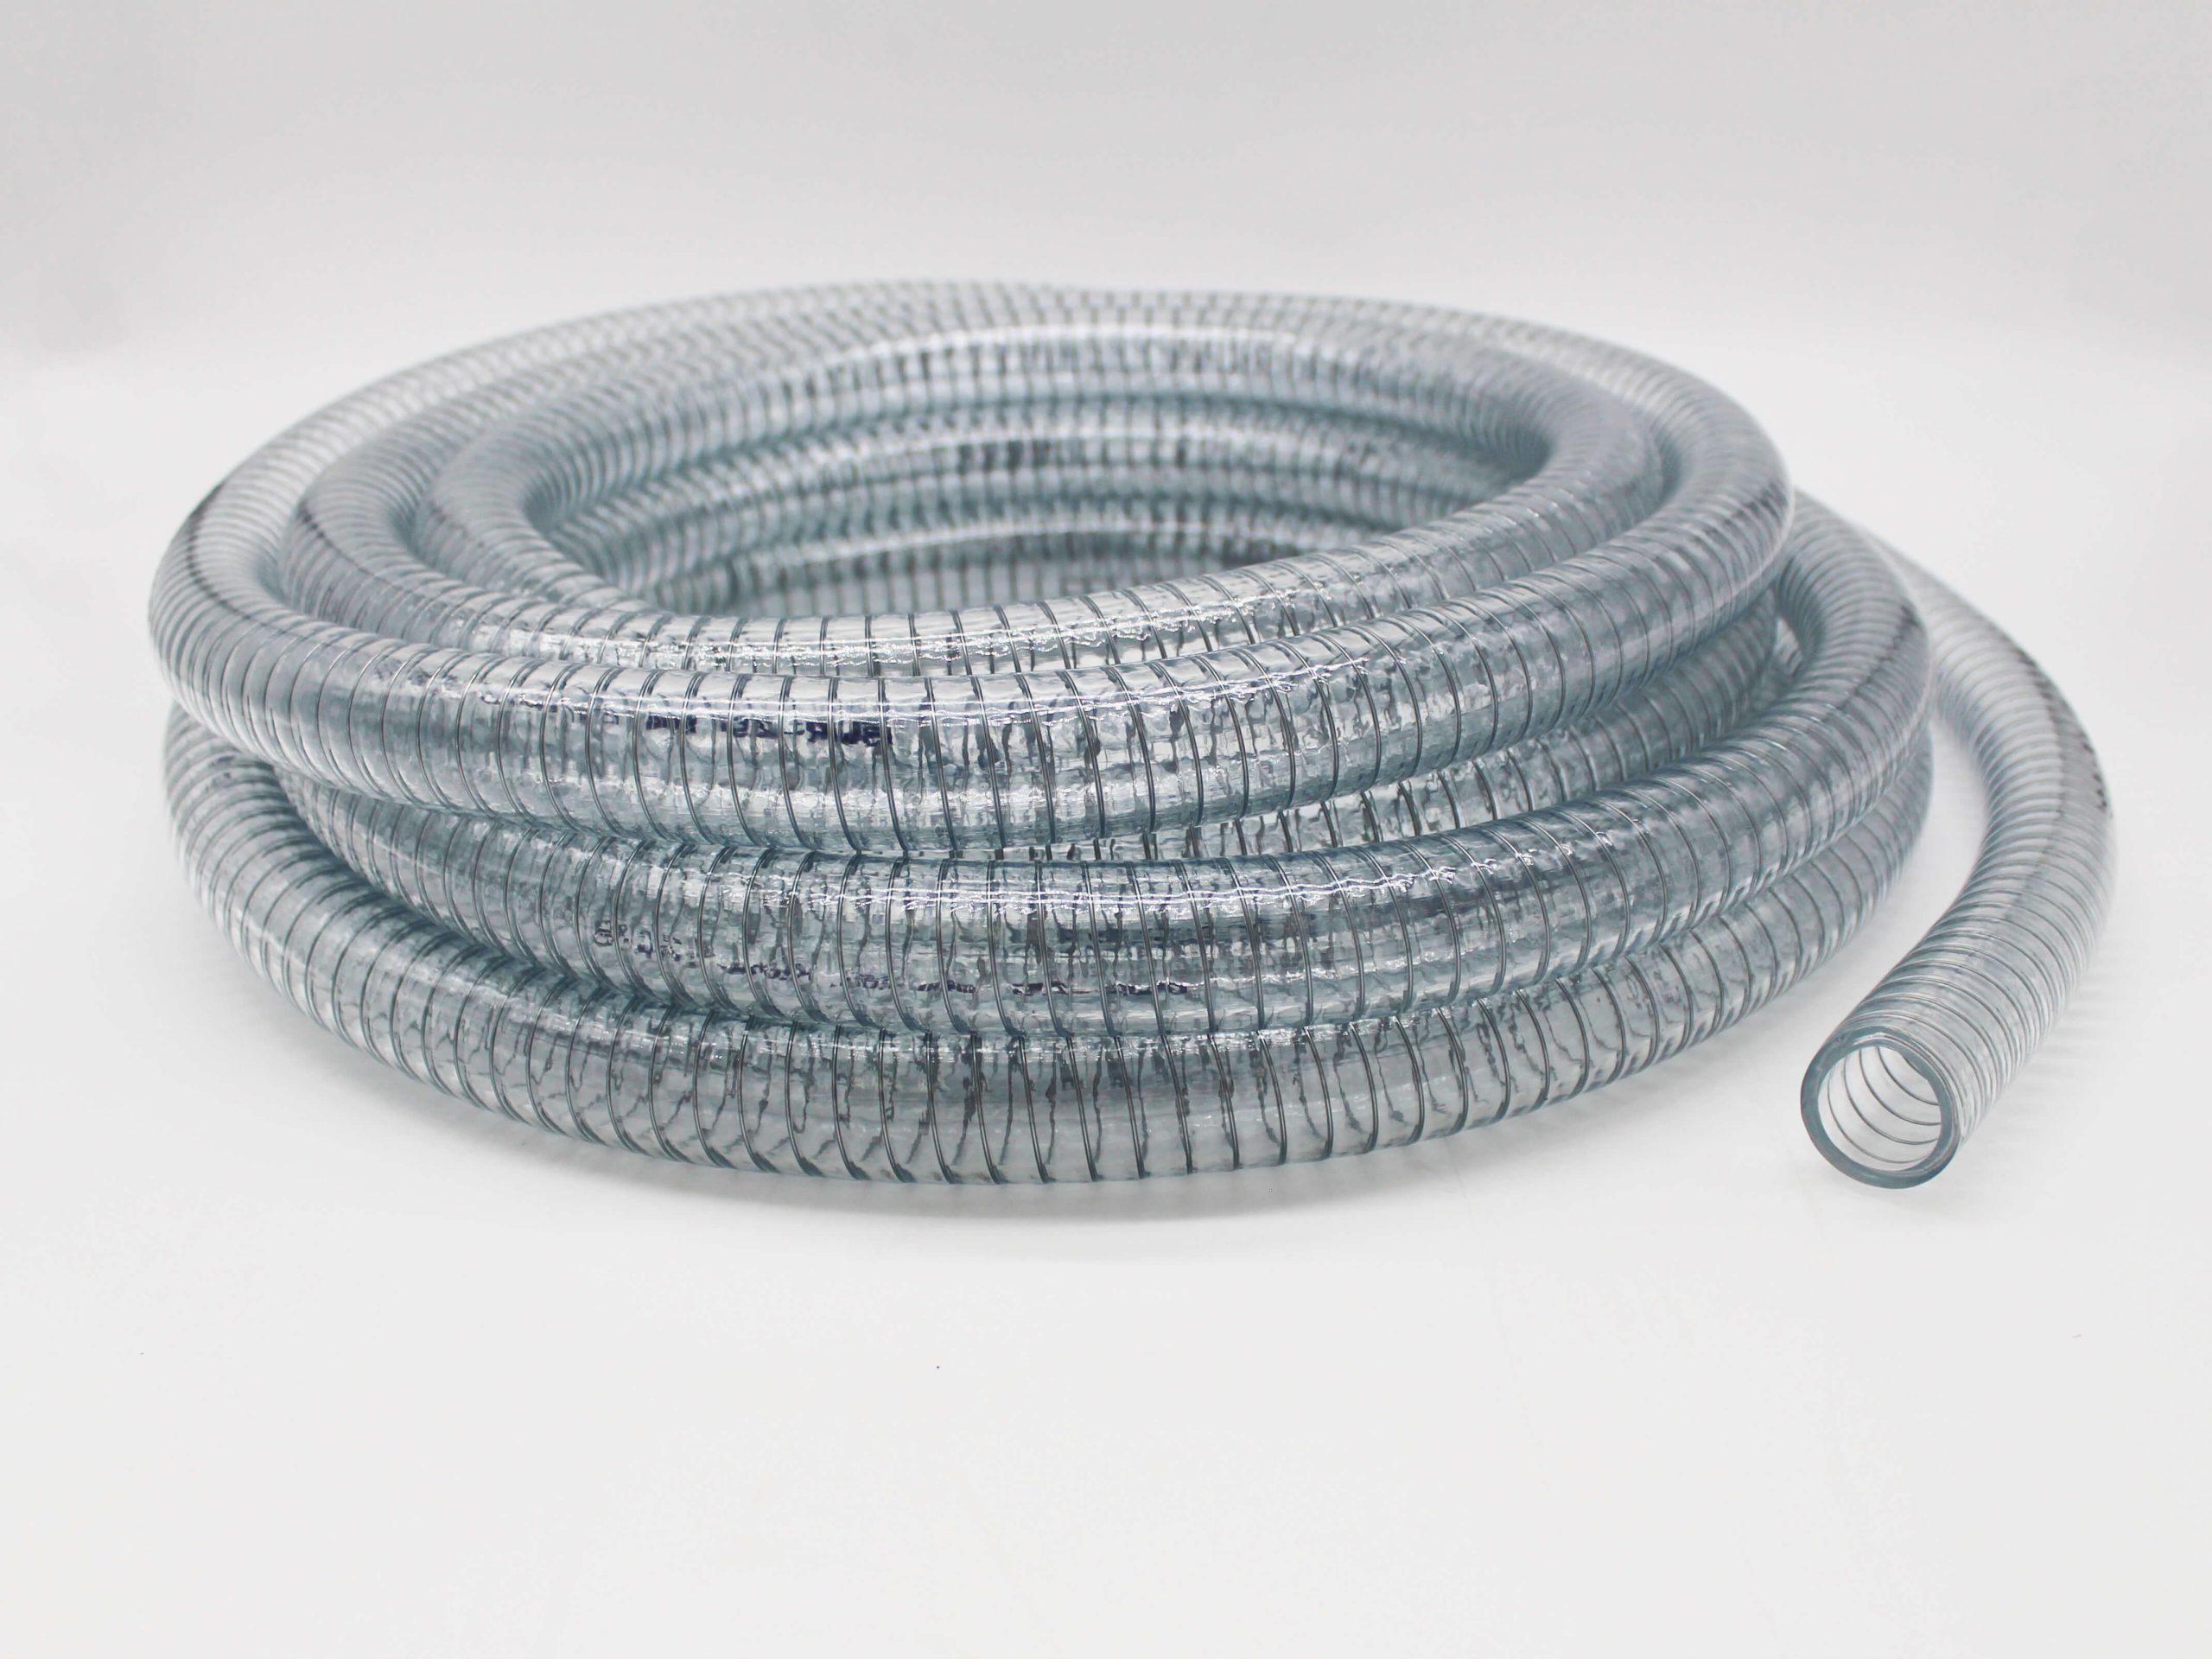 Clear Steel Braided PVC Hose